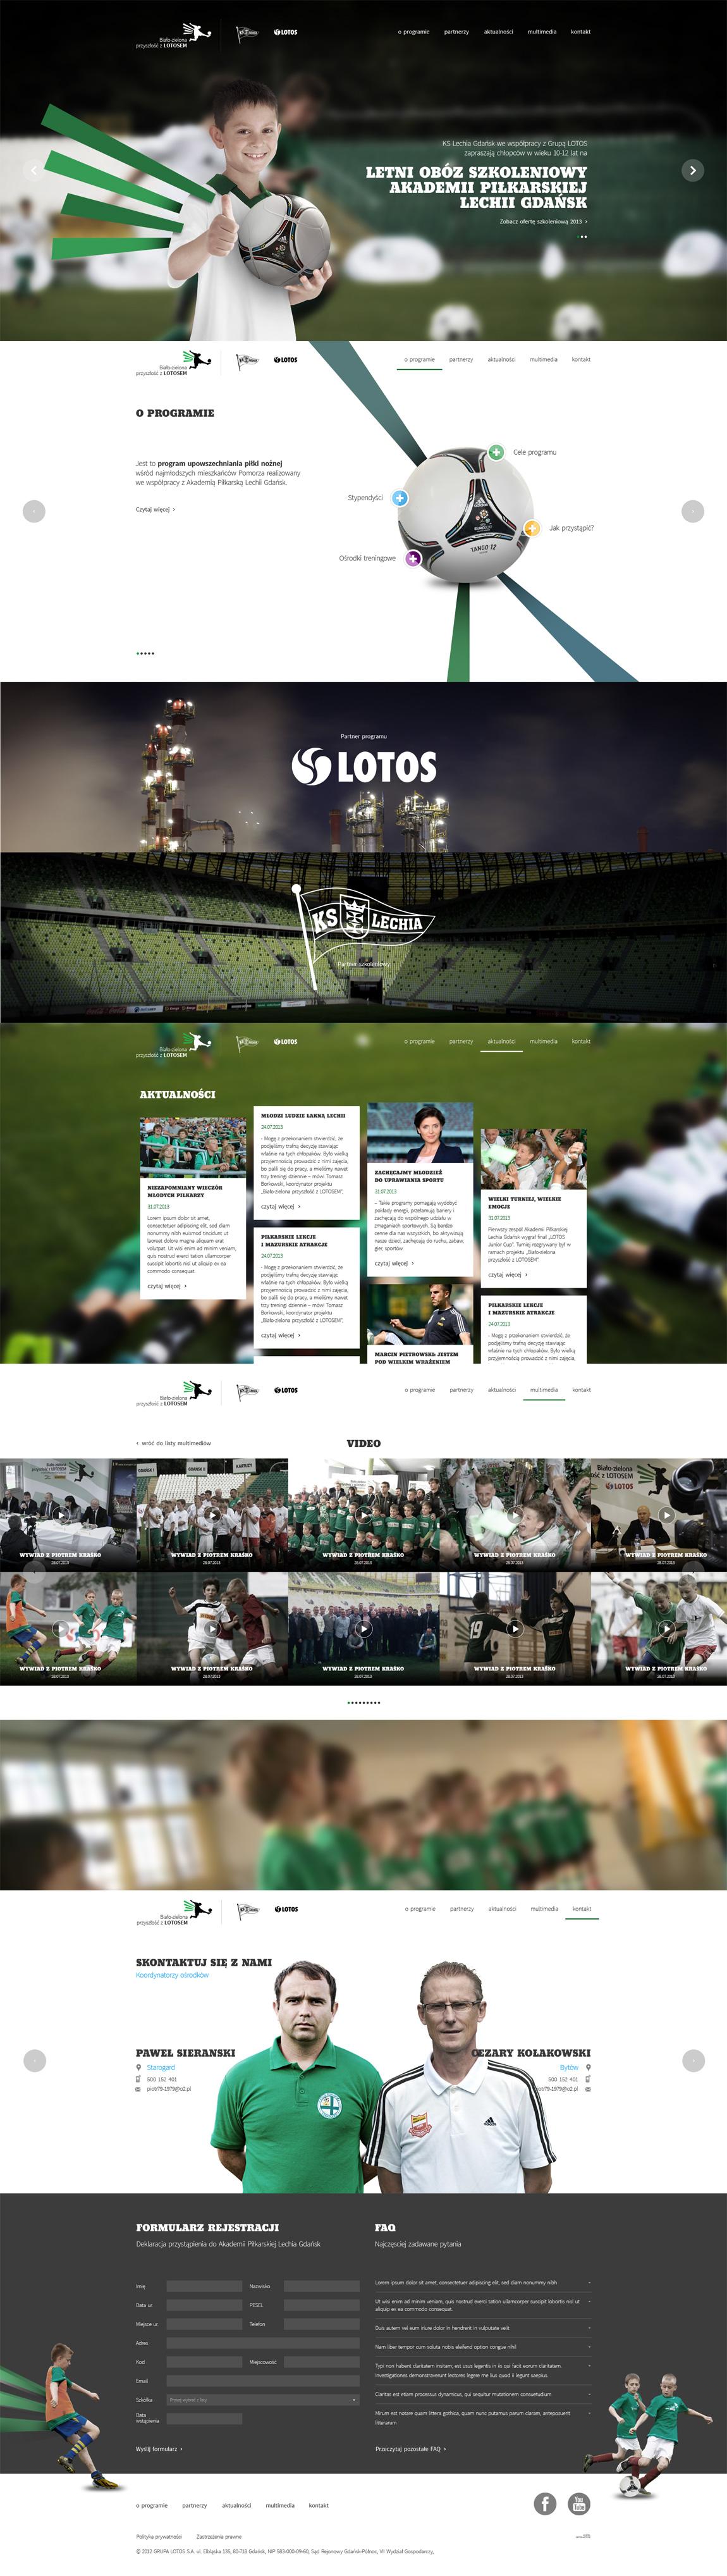 LOTOS Young Footballers Promotion Programme Website Screenshot